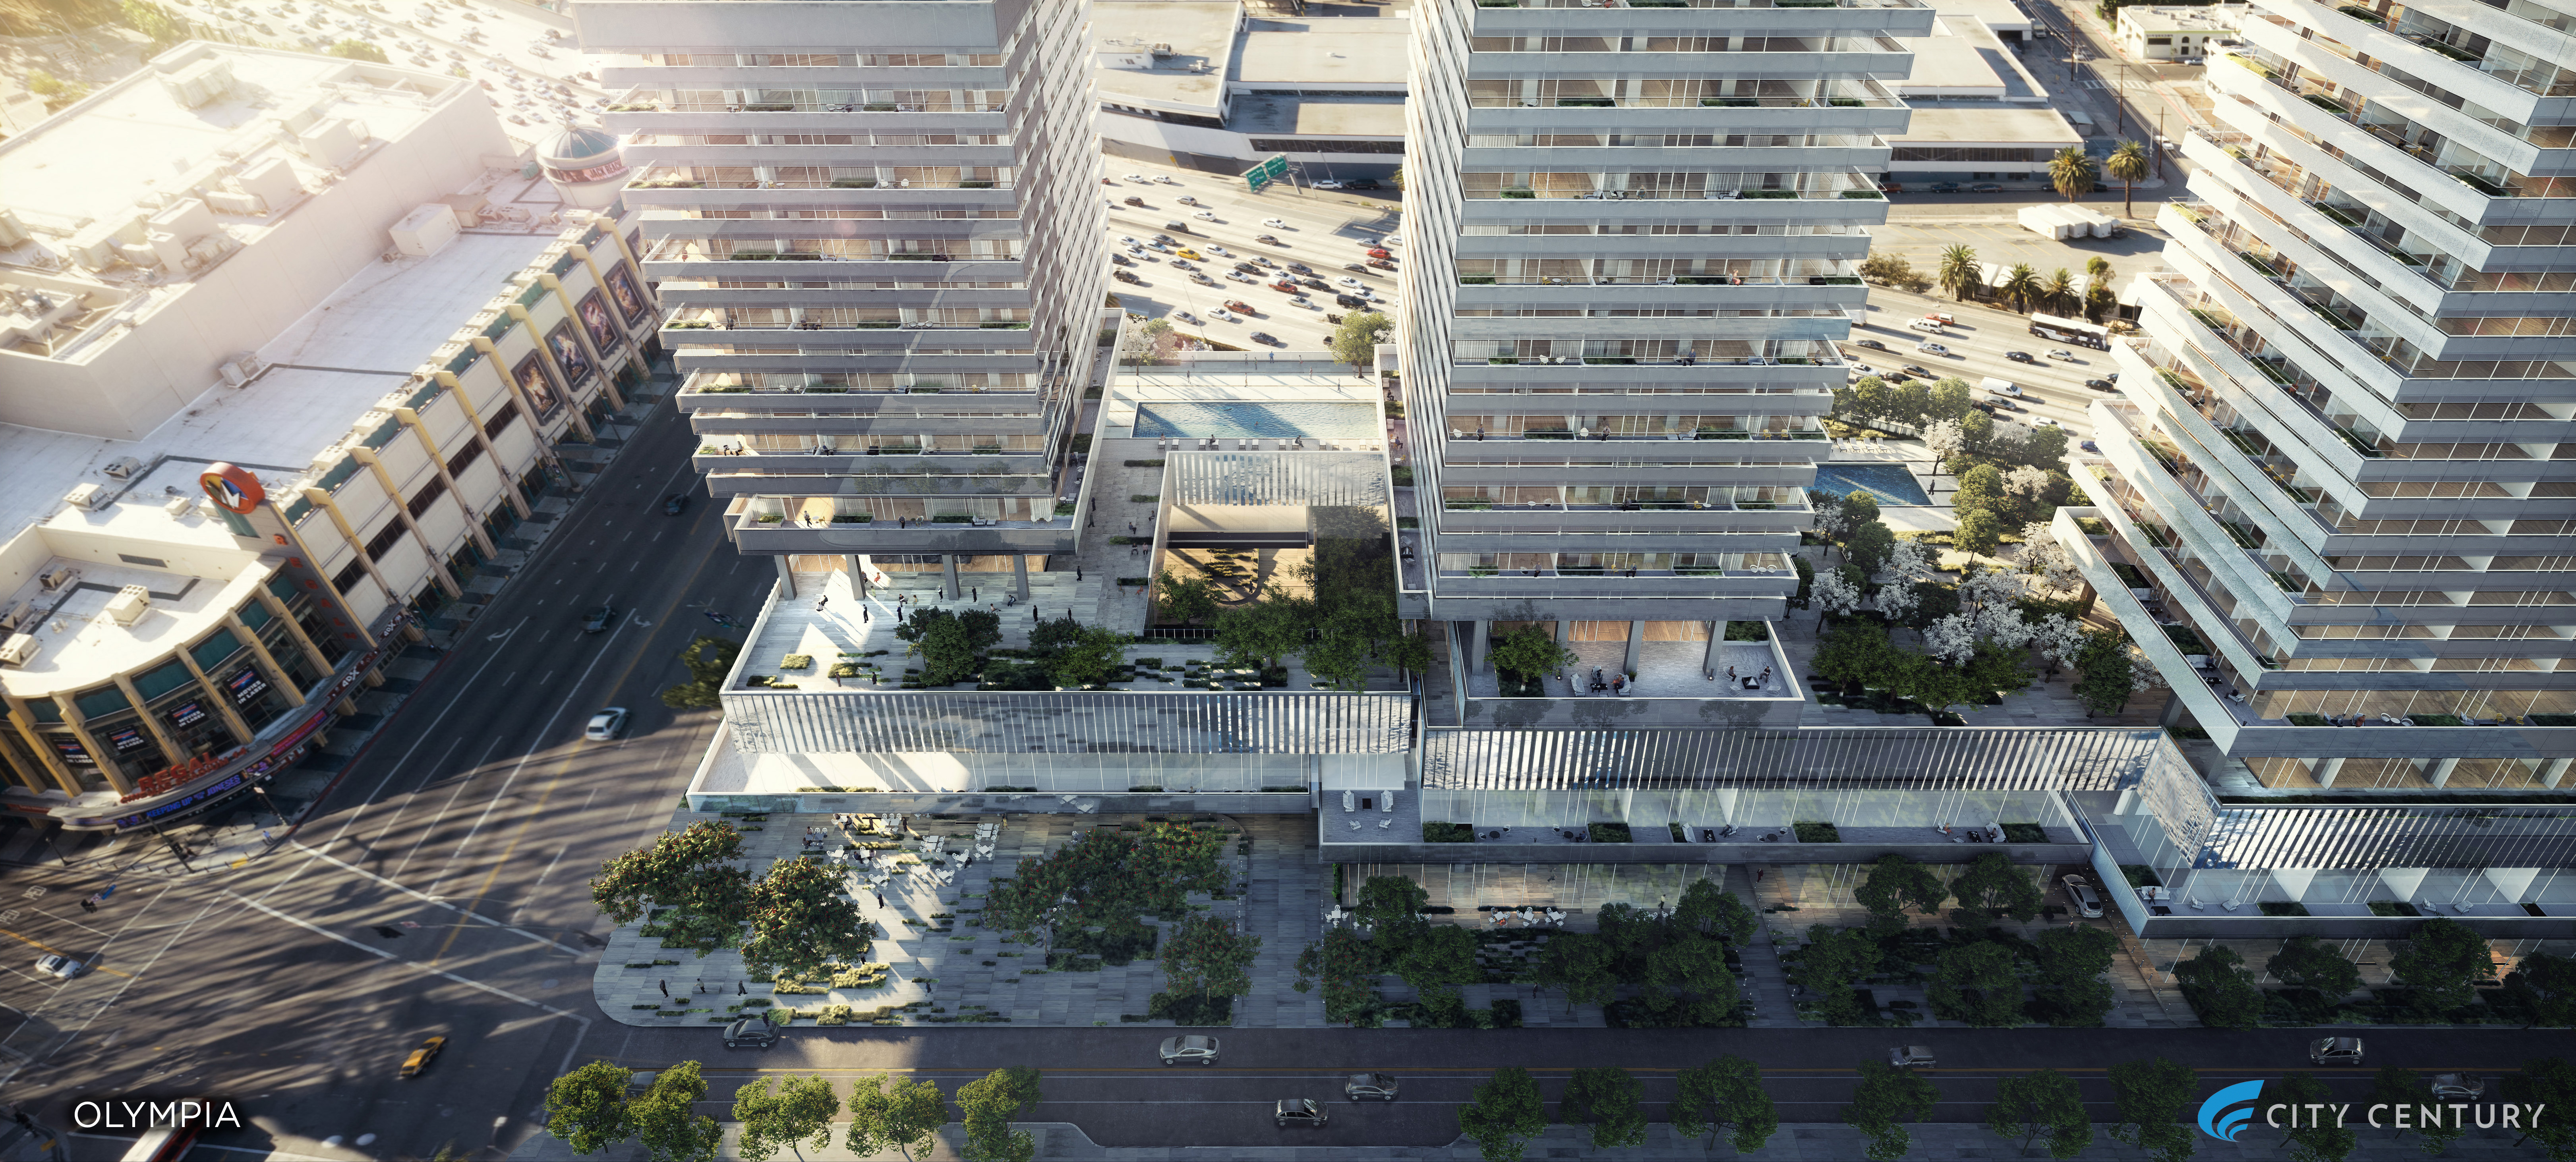 Freeway-facing balconies return to Downtown megadevelopment